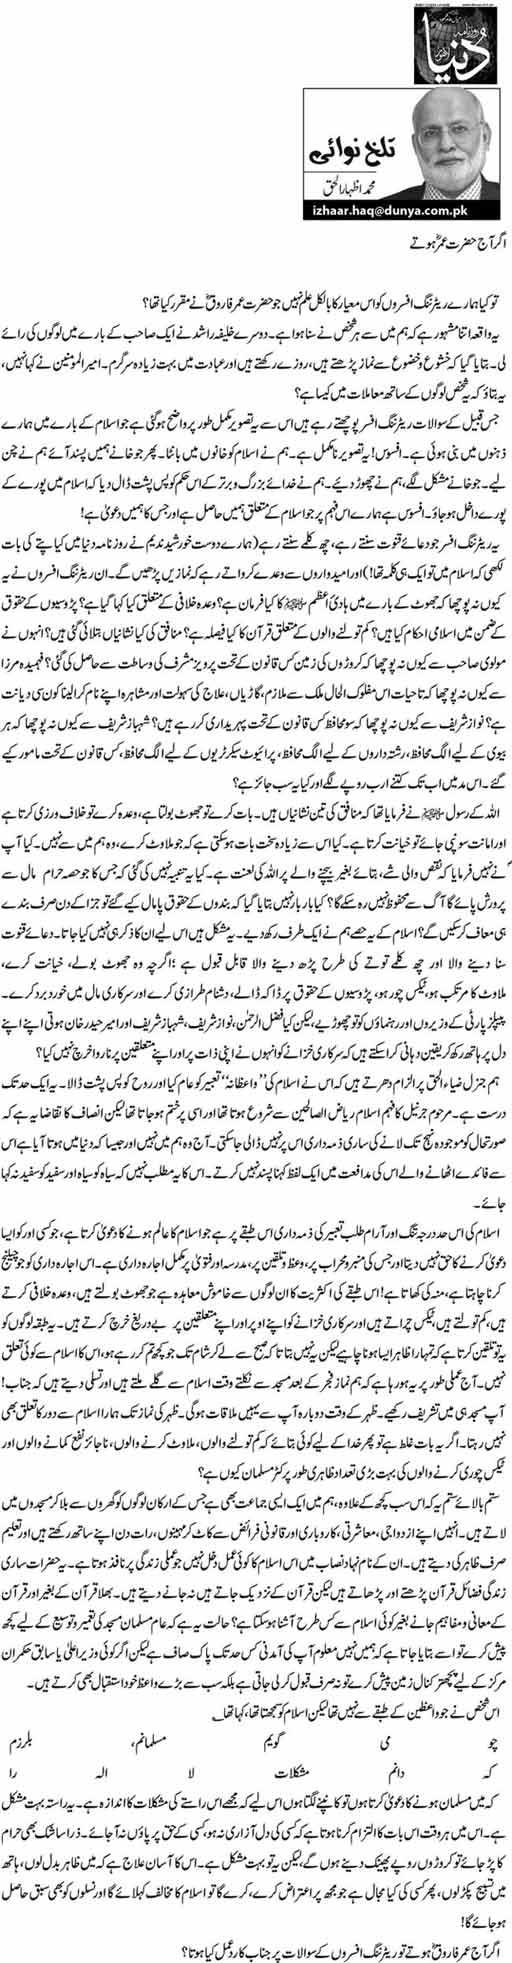 Agar Aaj Hazrat Umar Hotay - M. Izhar ul Haq